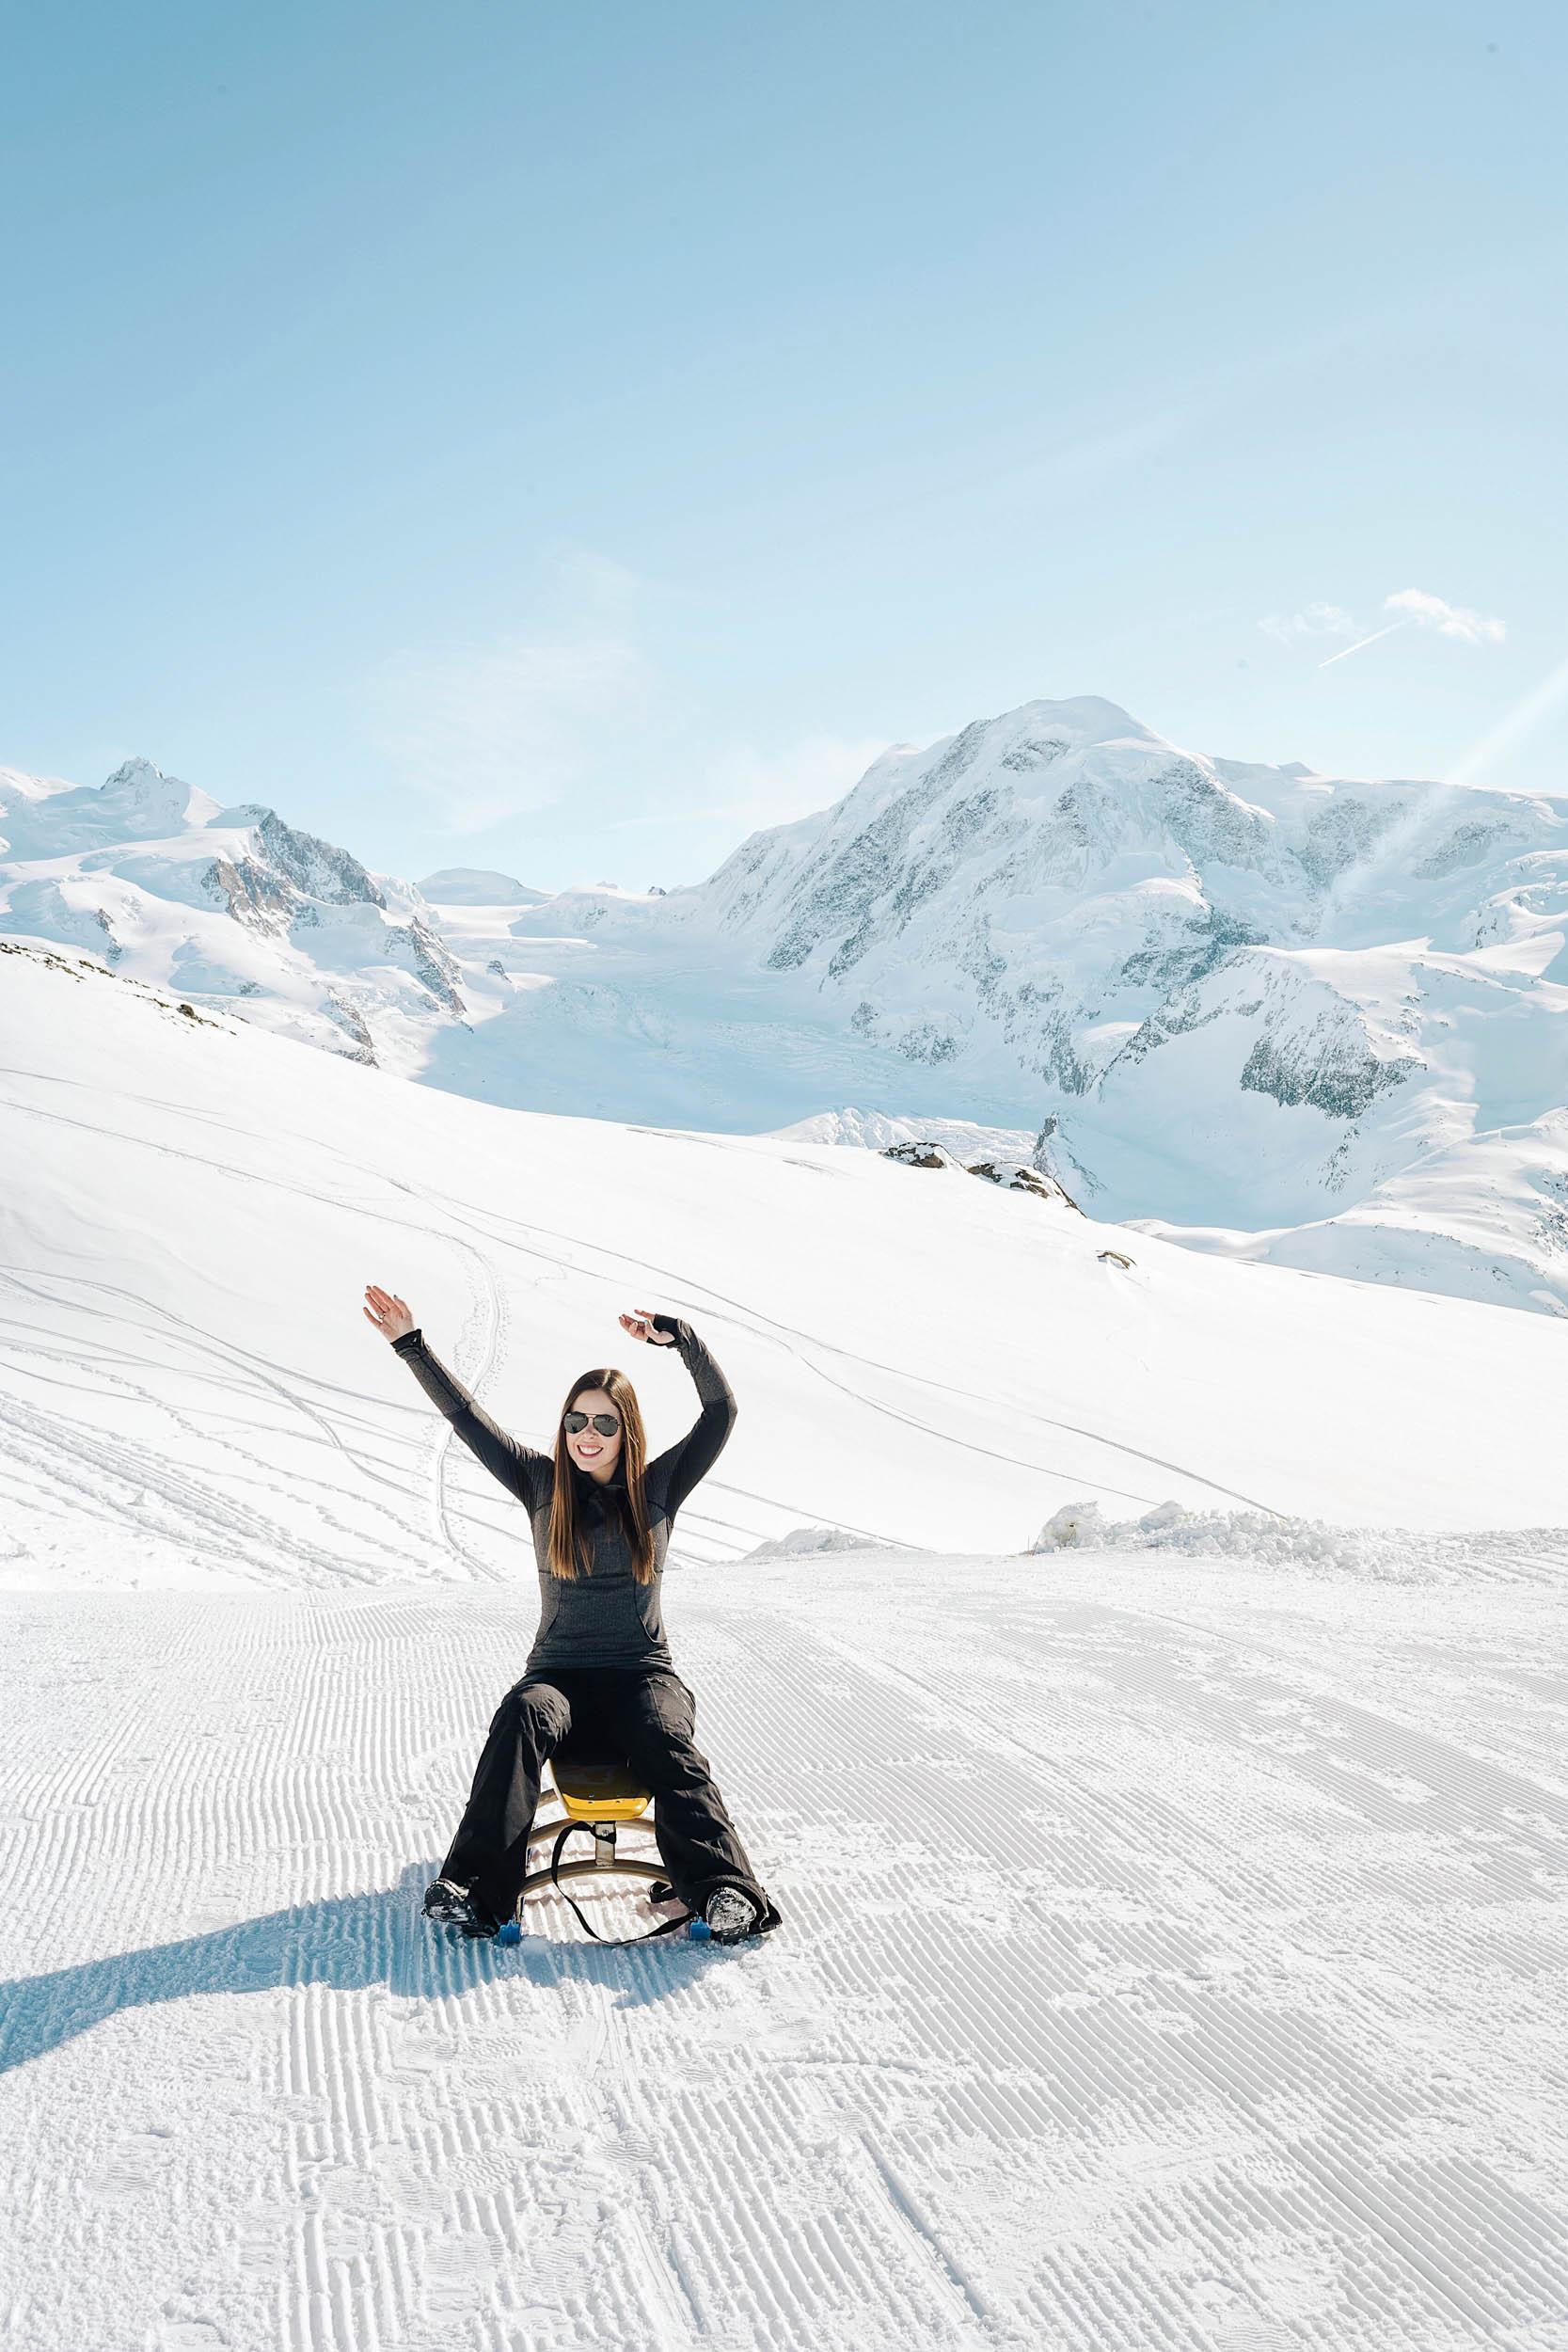 A beautiful winter day tobogganning in Zermatt